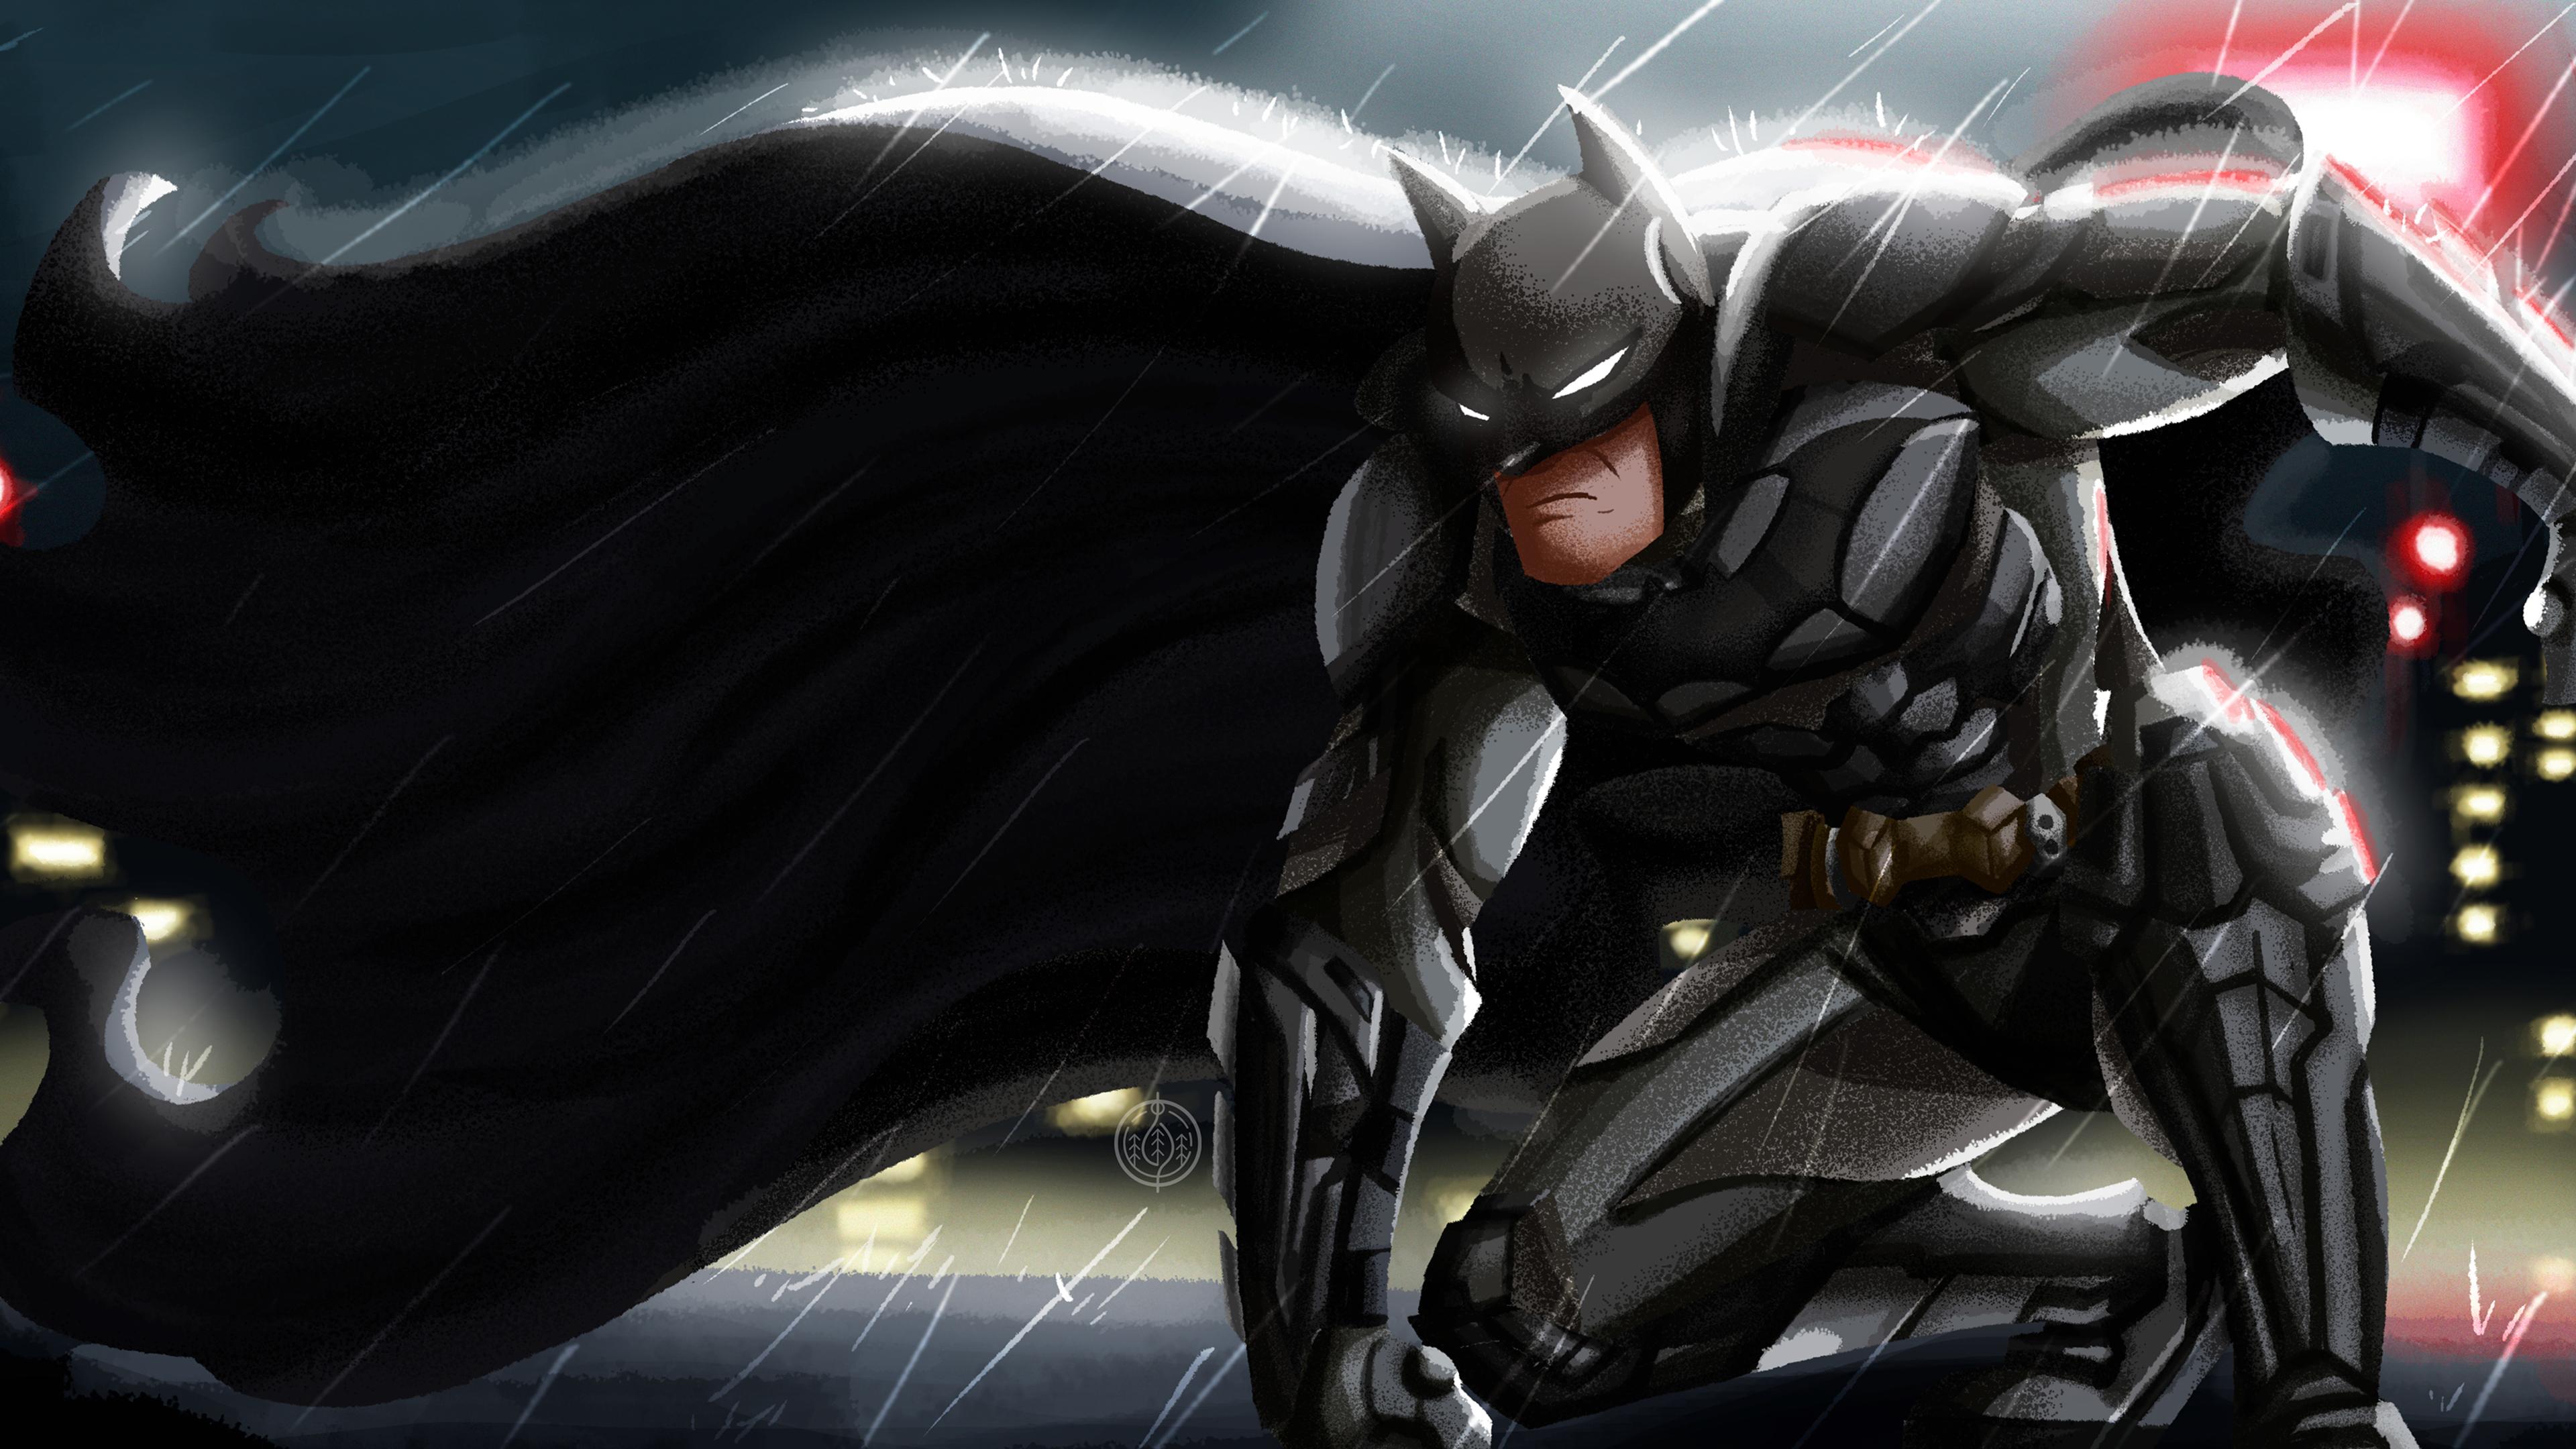 View 4K Batman Wallpaper Gif - Download Gaming Wallpaper 4K